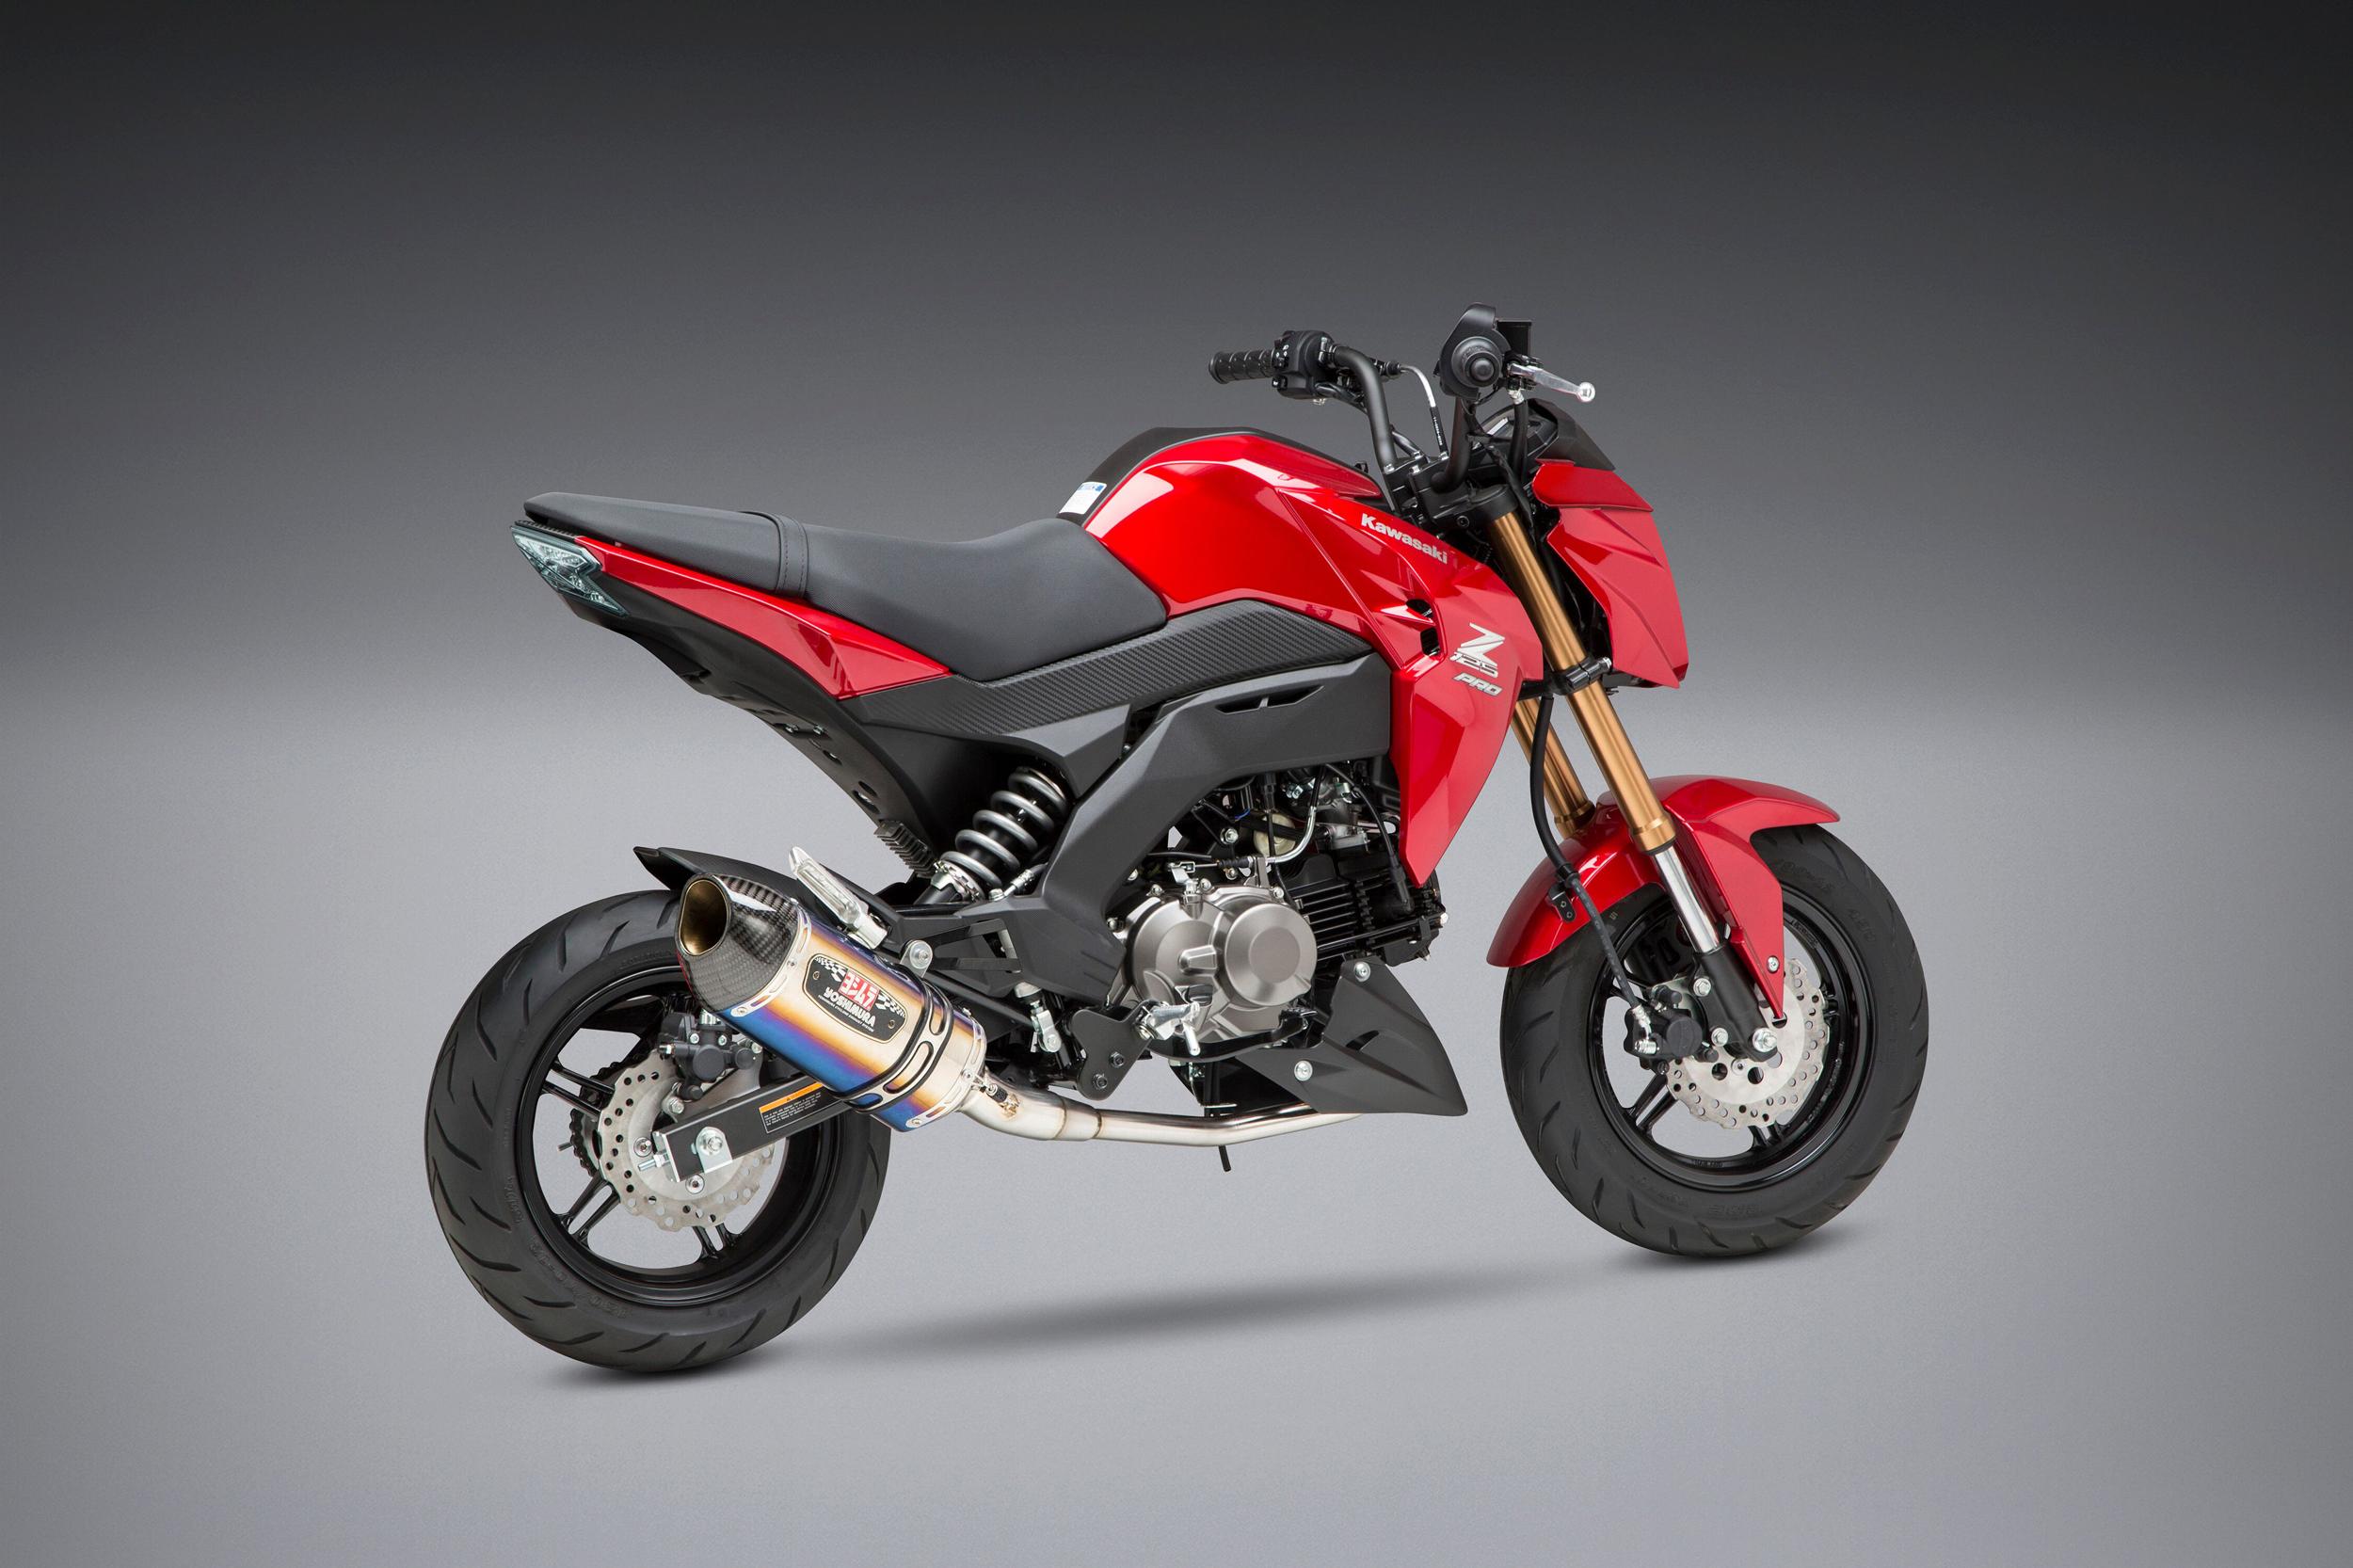 2019 Kawasaki Z125 Pro with Yoshimura R-77 titanium Race Series system